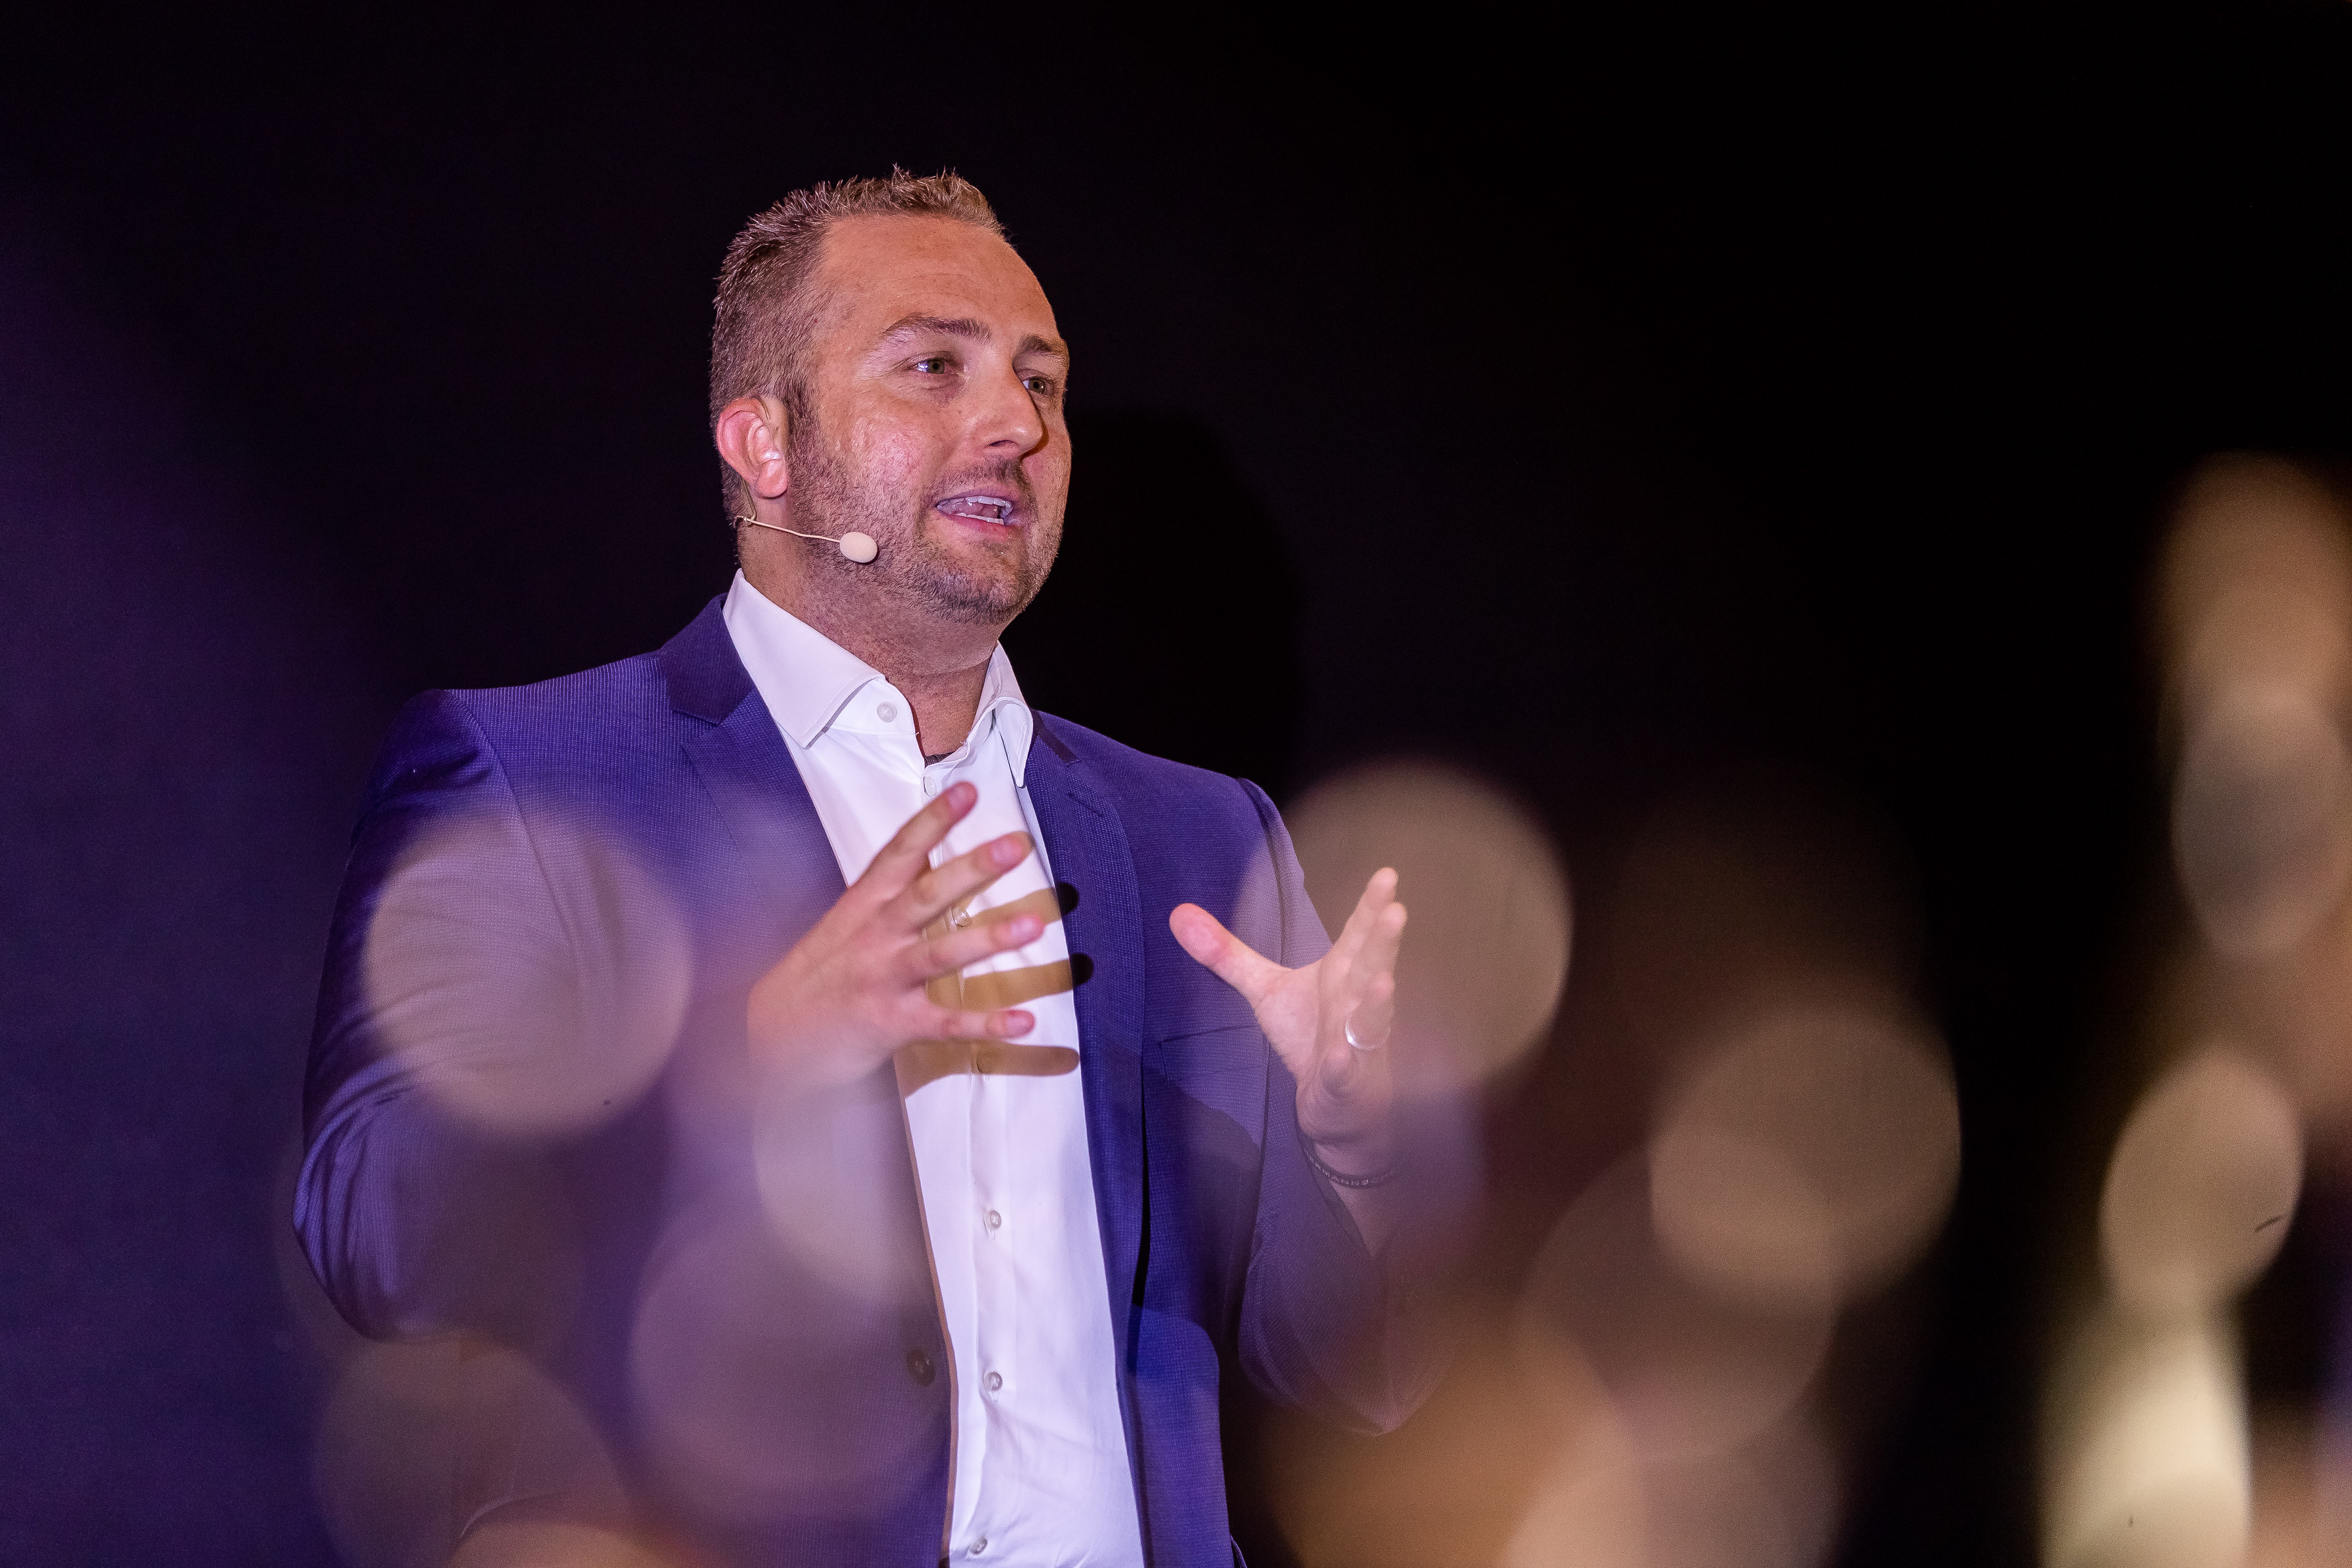 Expert Marketplace -  Michael Maute - Impressionen eins